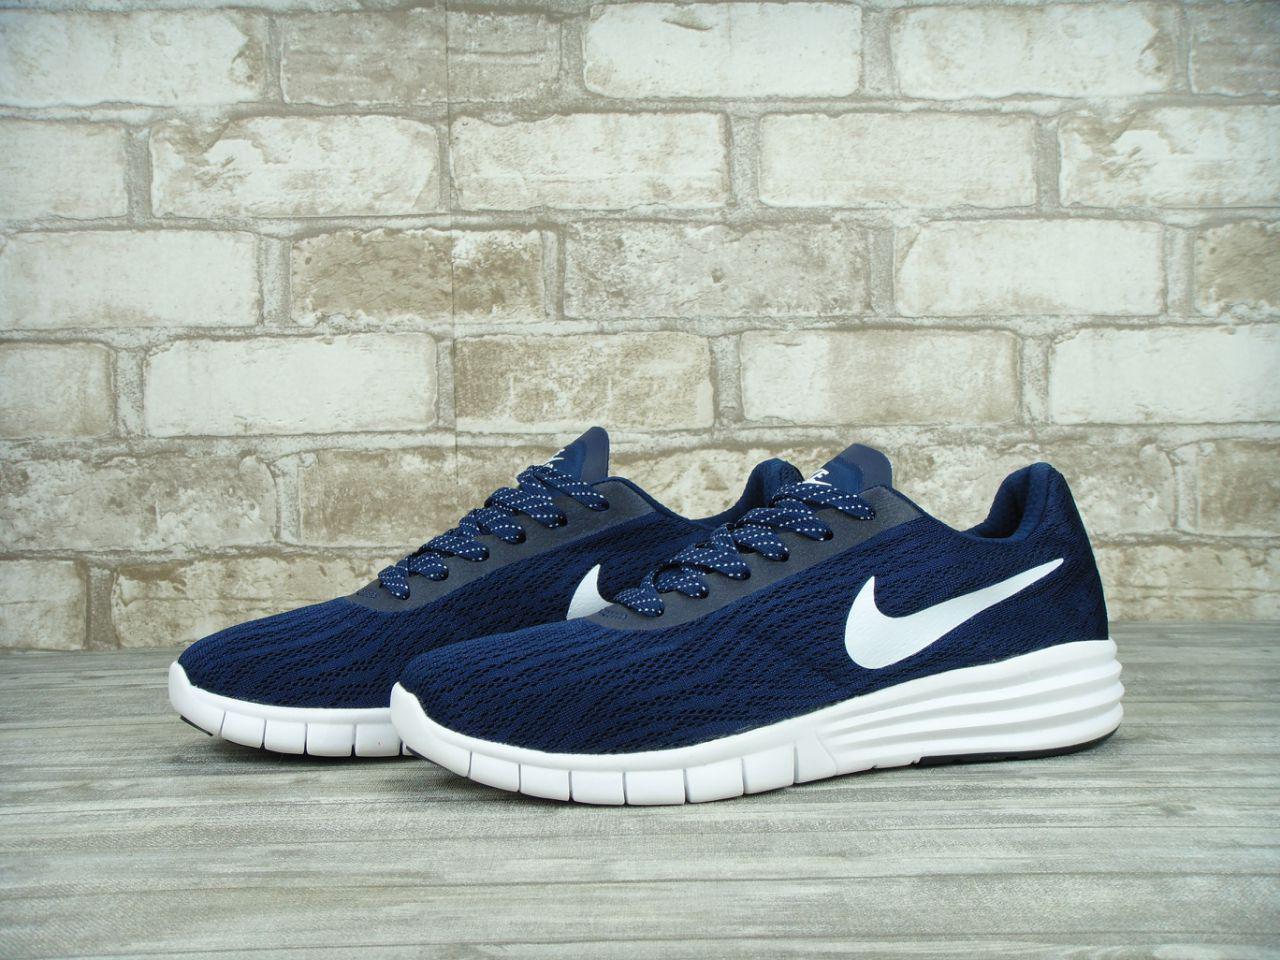 Кроссовки Nike Paul Rodriguez реплика ААА+ размер 42 синий (живые фото), фото 1